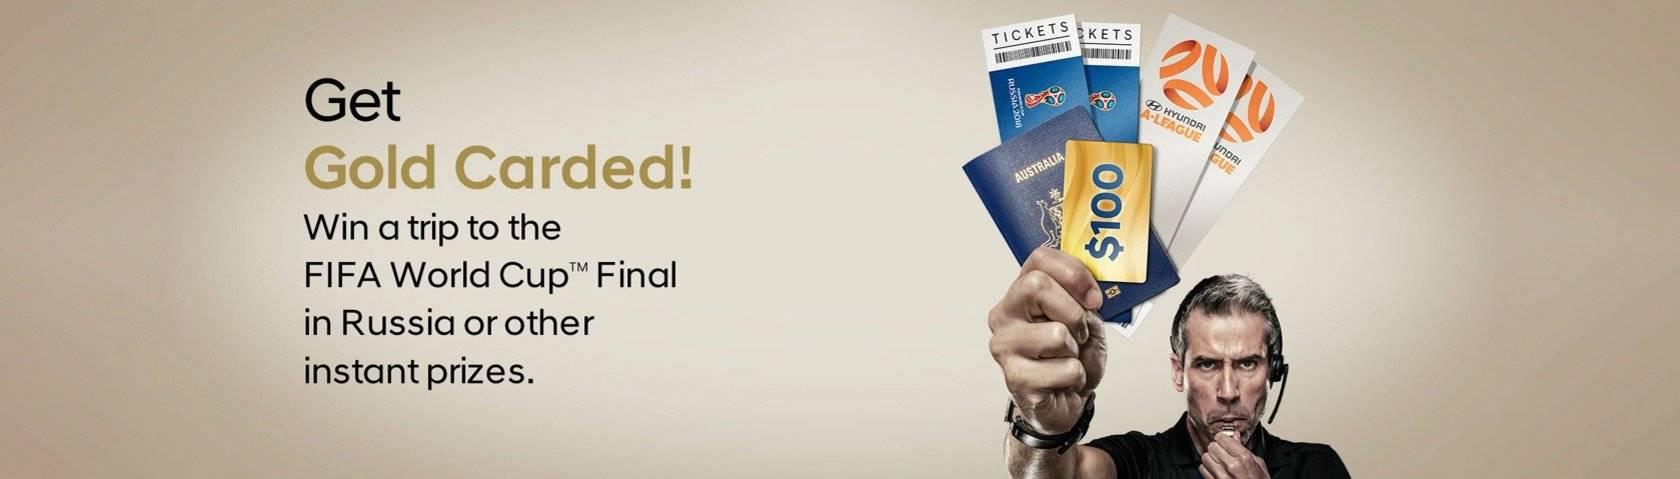 DVG Hyundai Gold Card Promotion